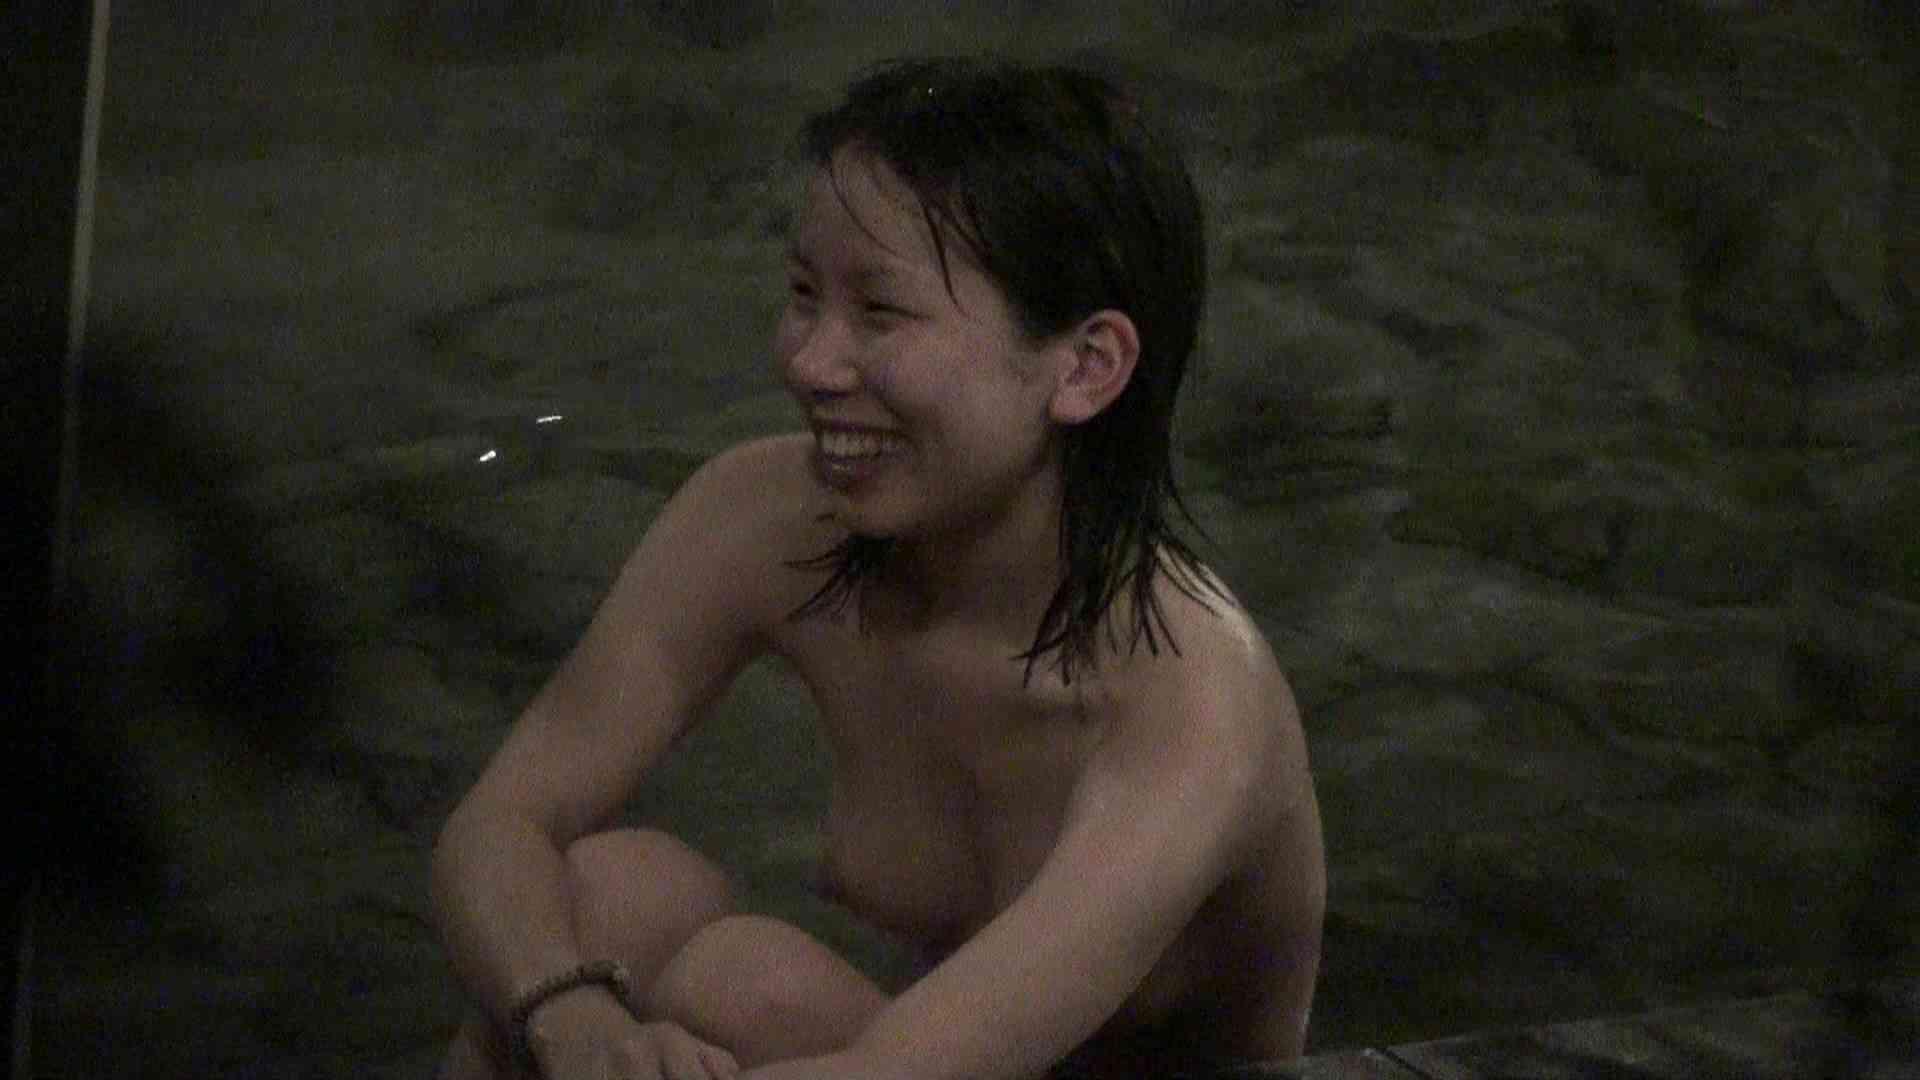 Aquaな露天風呂Vol.363 盗撮 | OLセックス  90画像 43